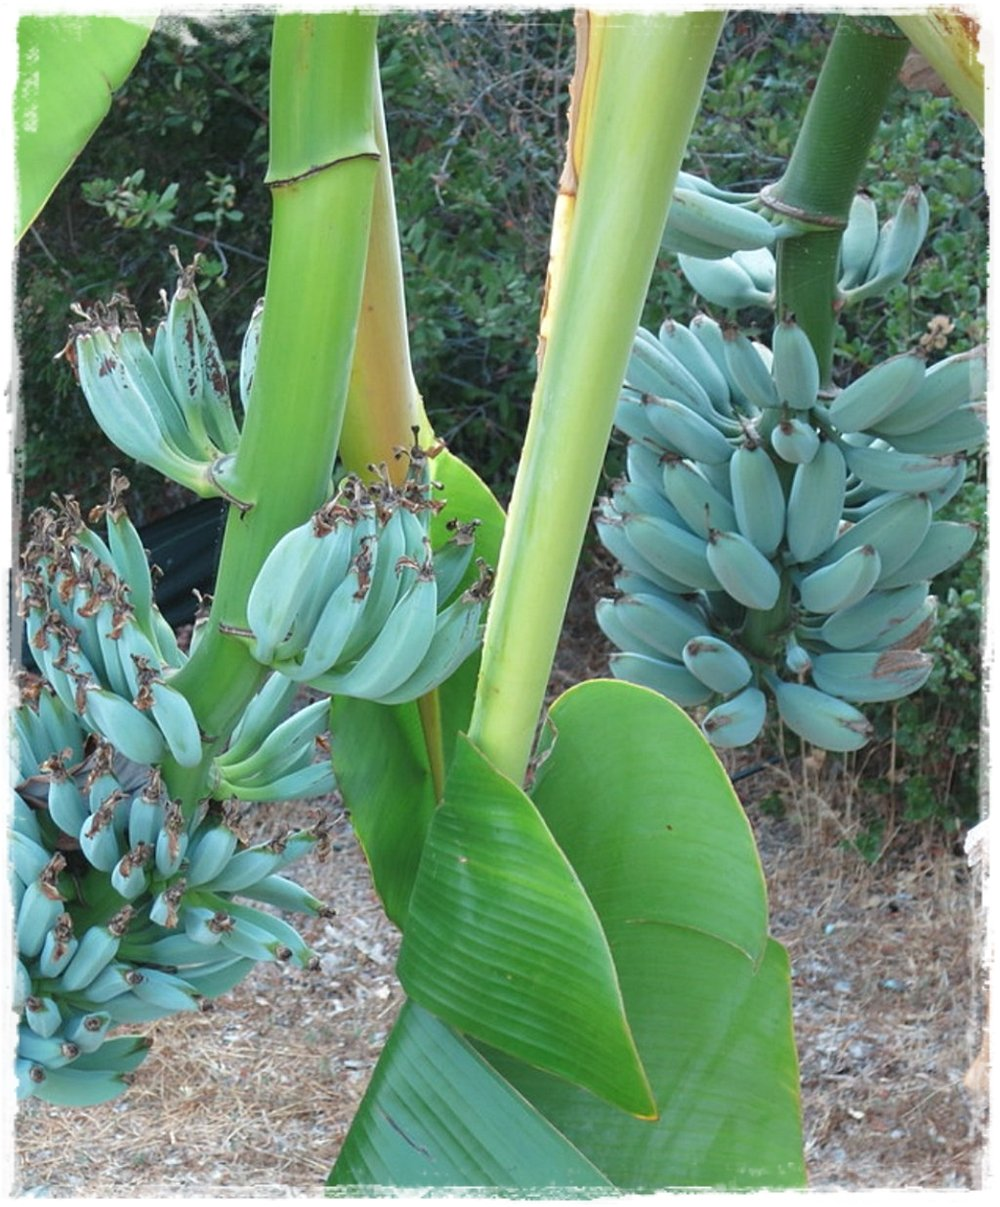 Pianta Di Banana Foto banano blue java 'musa acuminata'